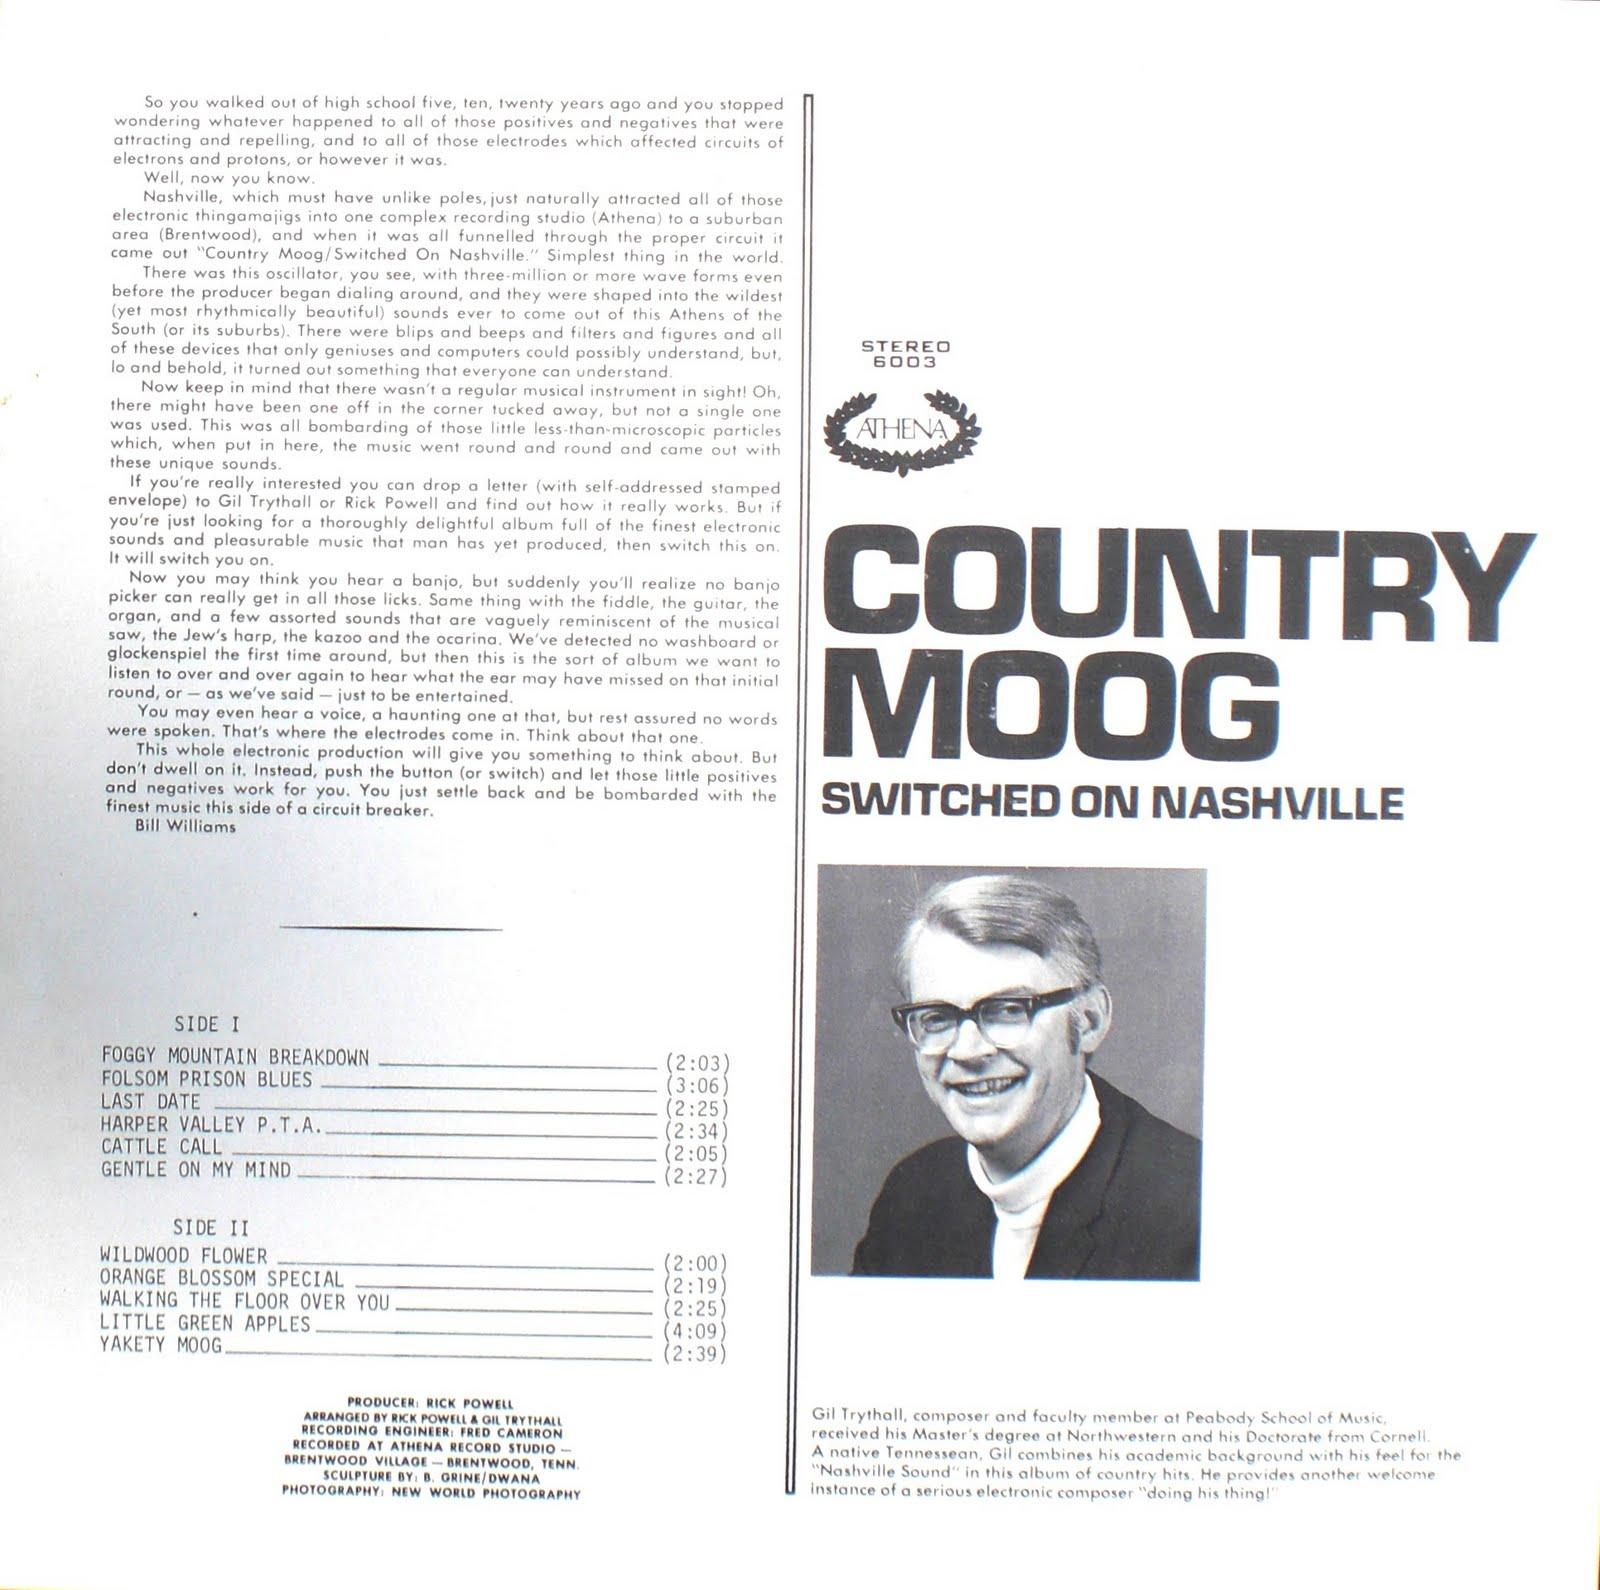 Gil Trythall - Yakety Moog / Foggy Mountain Breakdown